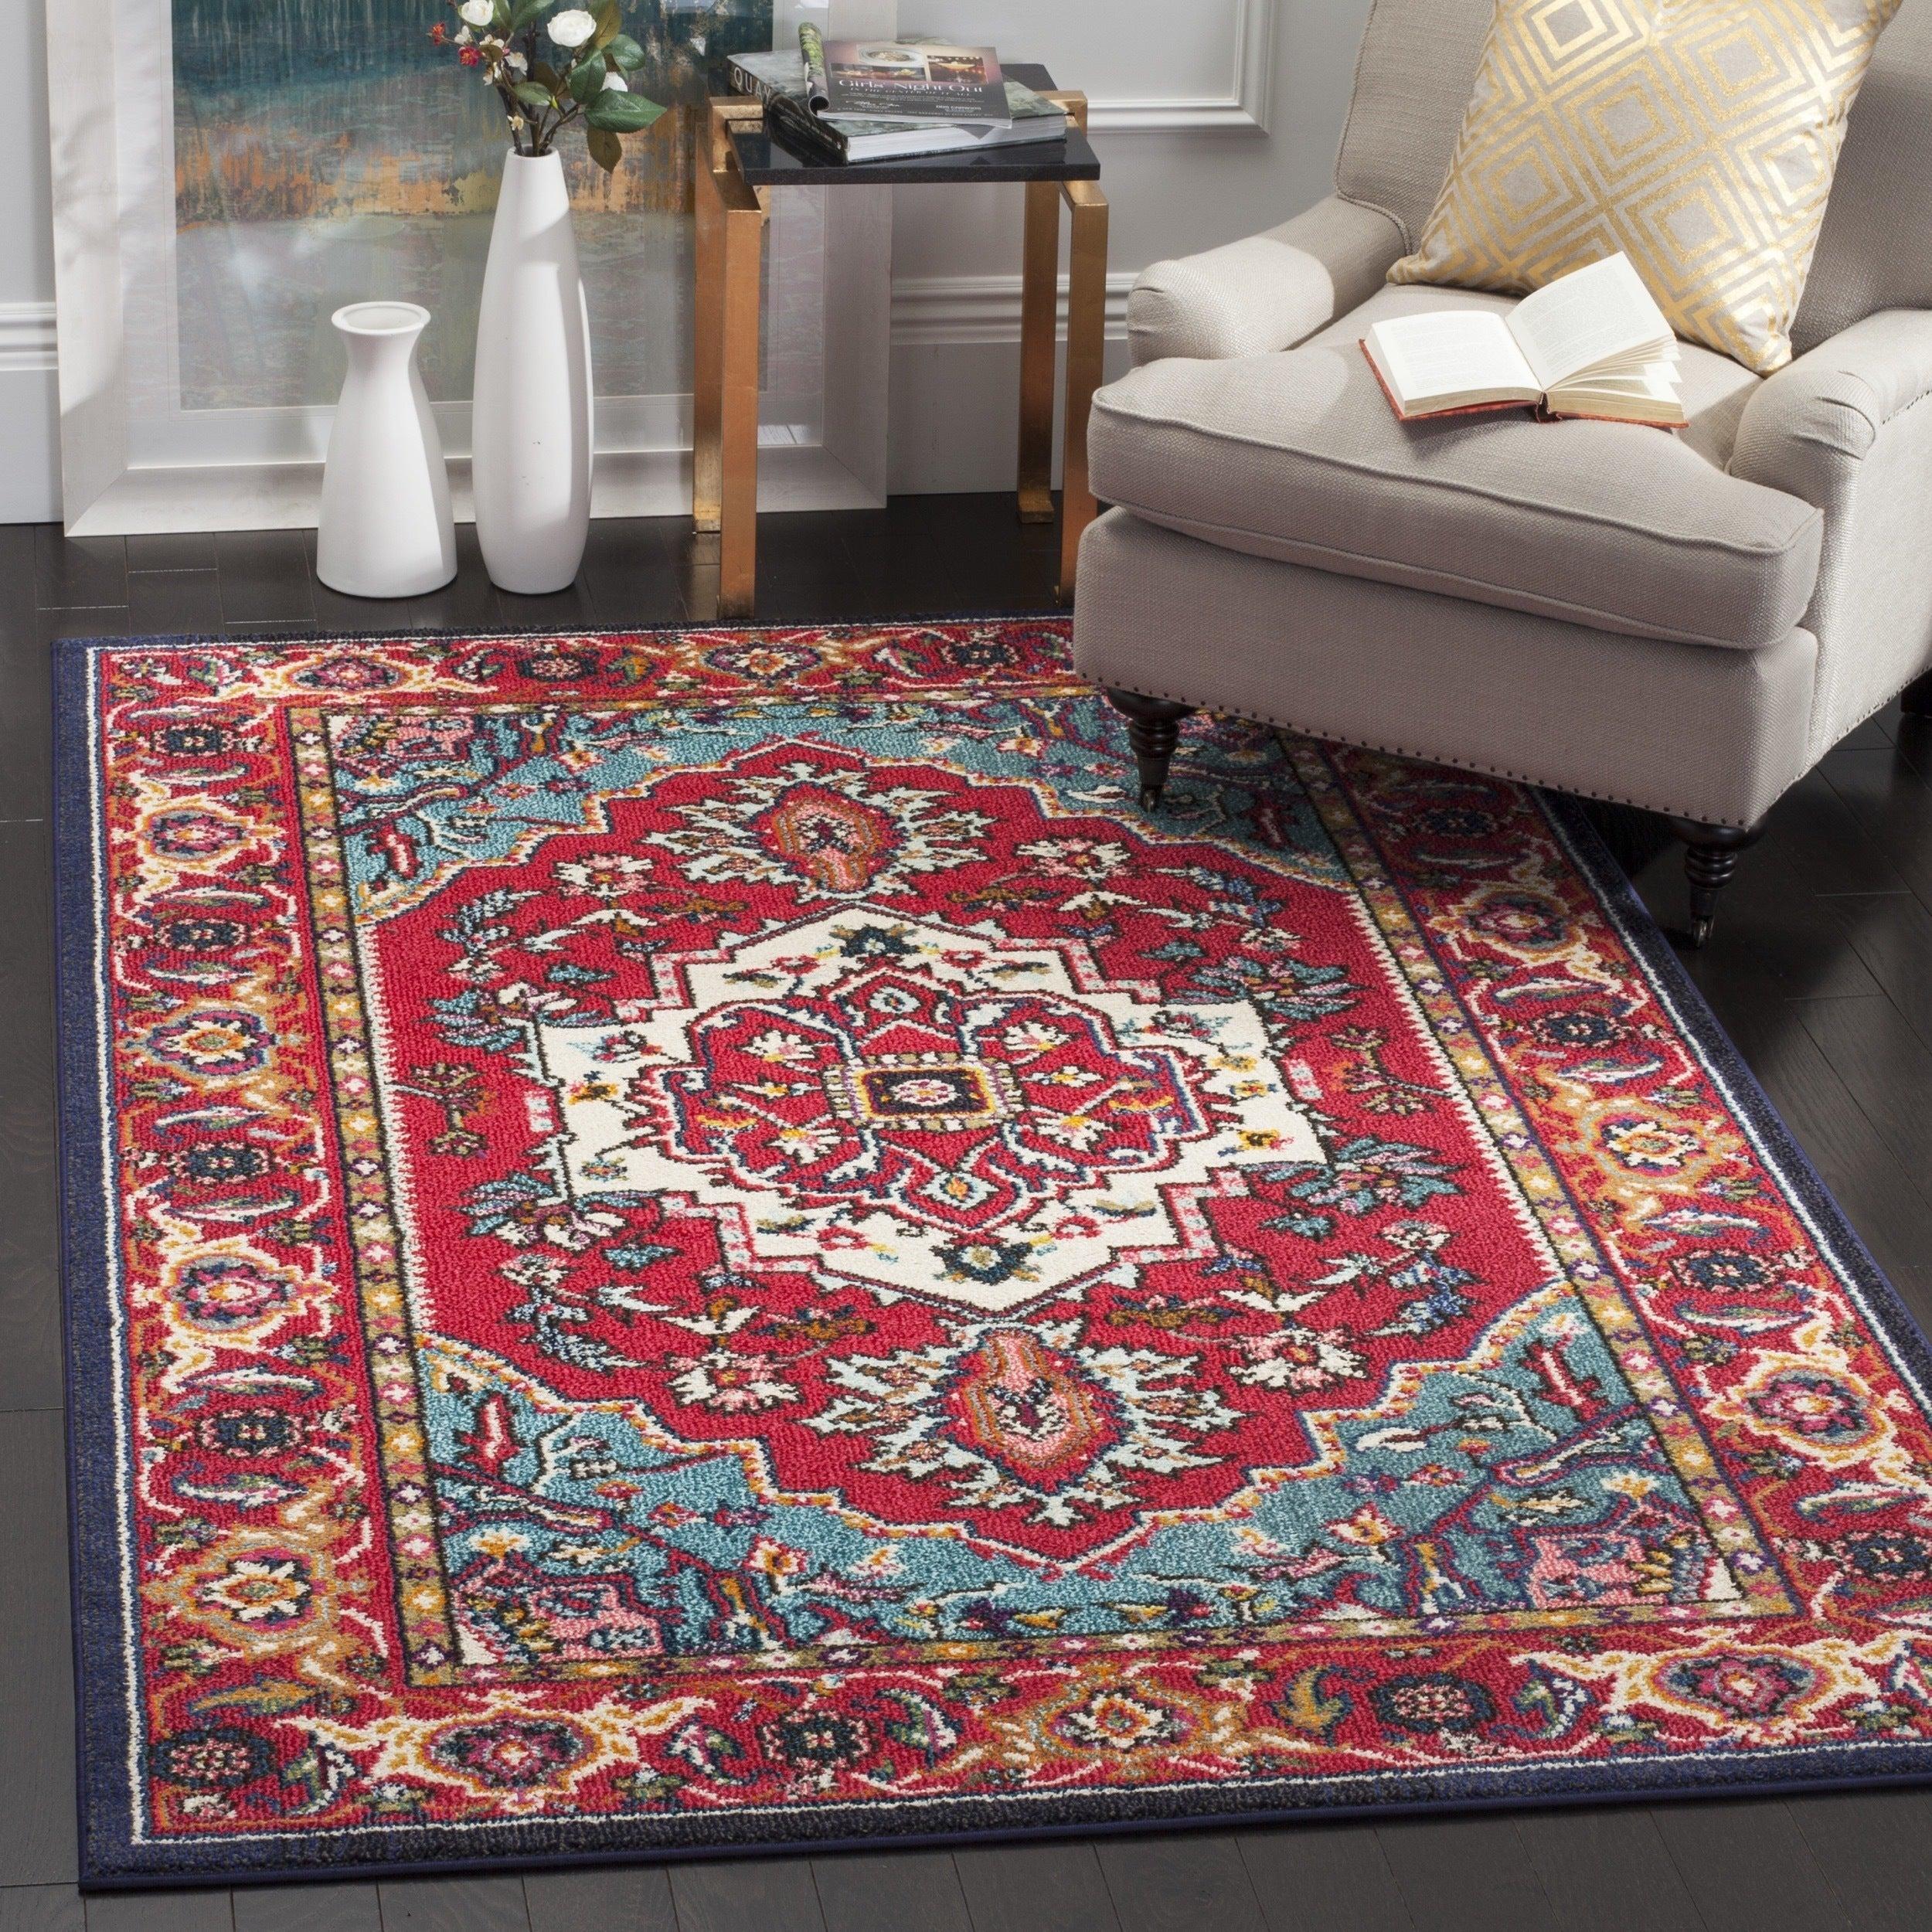 rugs il c rrqo rug bohemian turkish fullxfull floor feet oushak